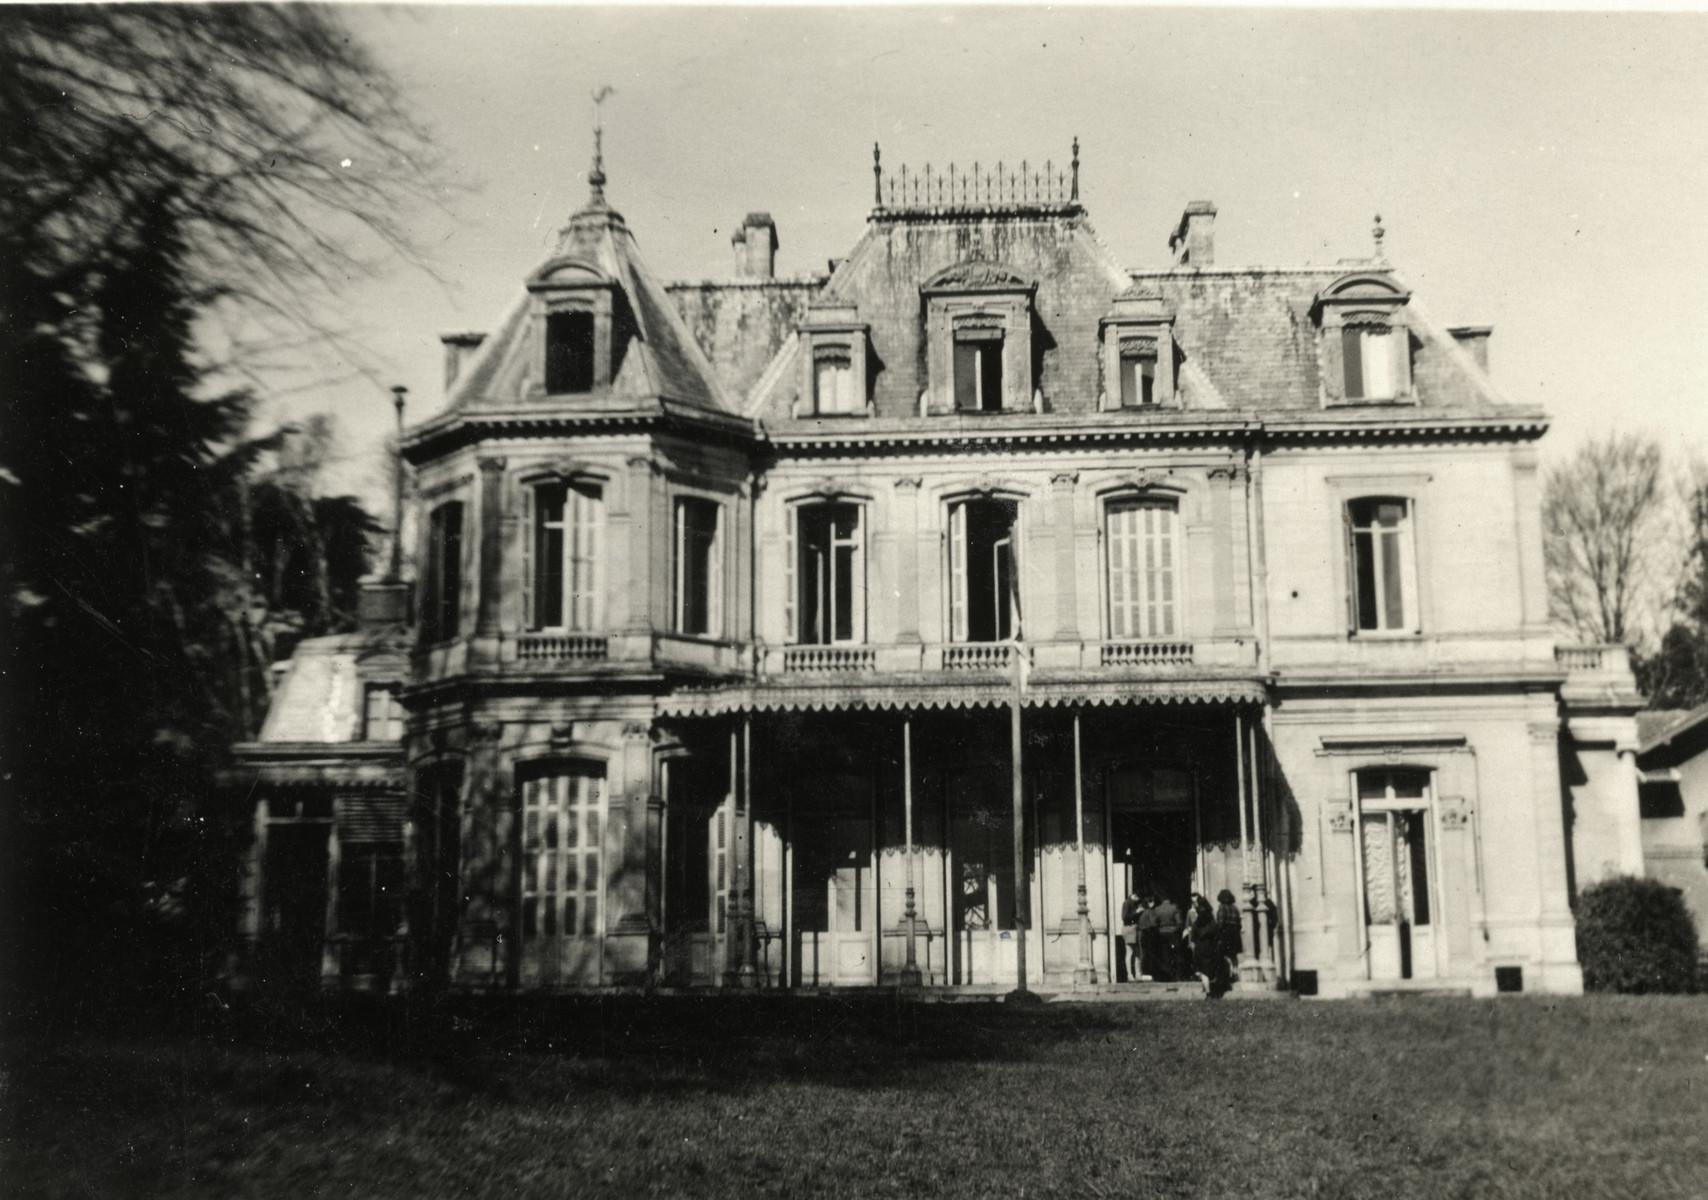 Exterior view of the Chateau de Monbardon, the home of a Borochov/Dror Hachshara outside of Paris.